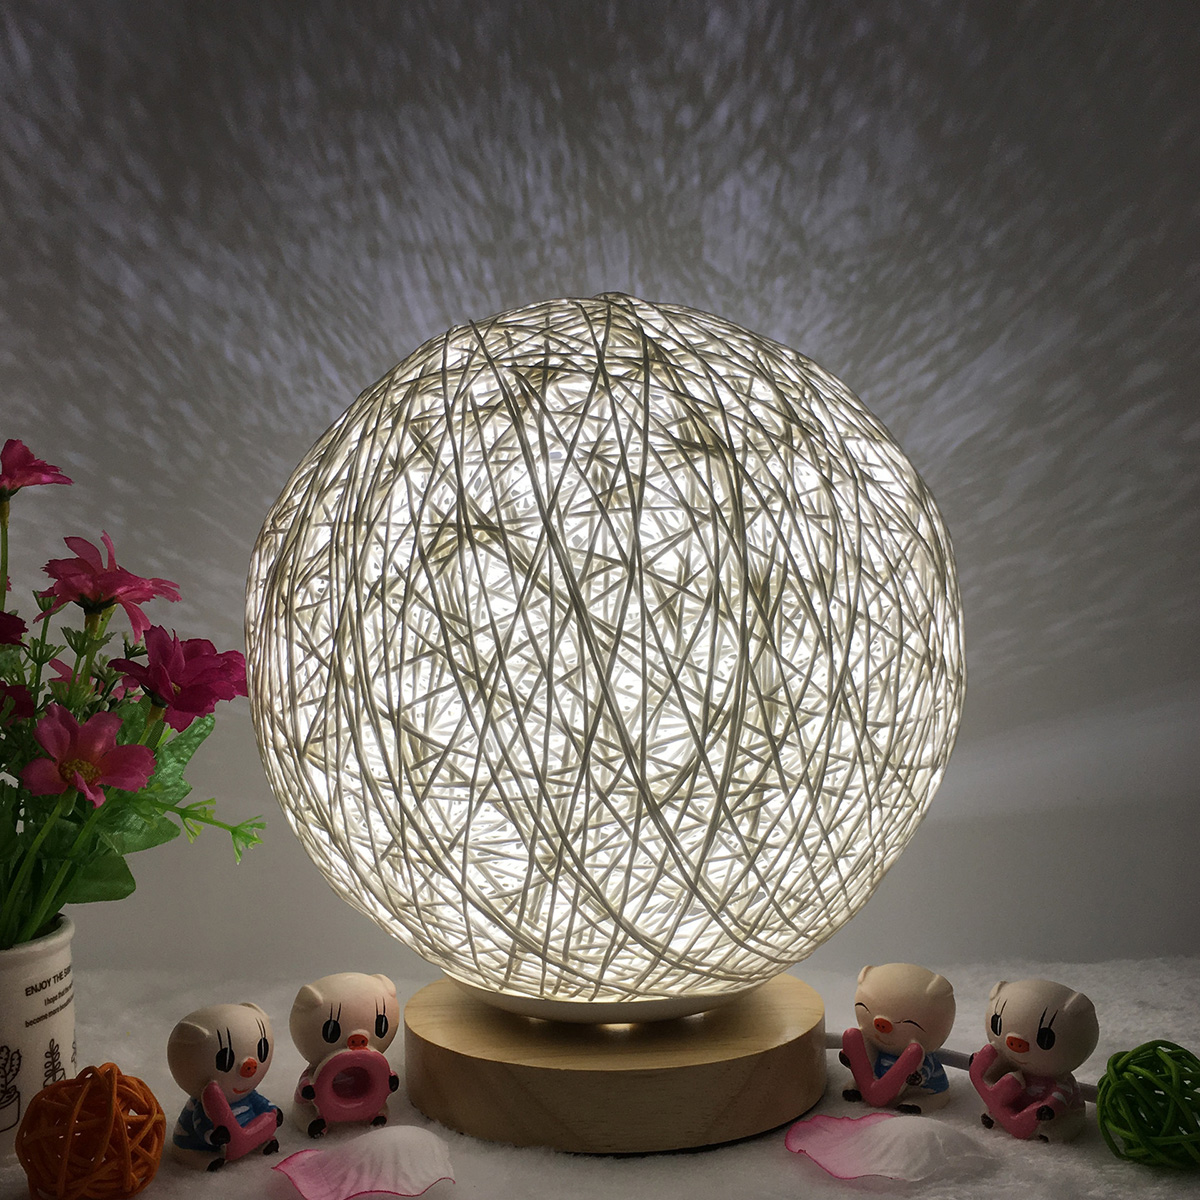 Creative  Table Lamp Hand-Knit Lampshade Wood Moon Lamp USB Bedroom Home Wedding Decoration Moonlight Night Light